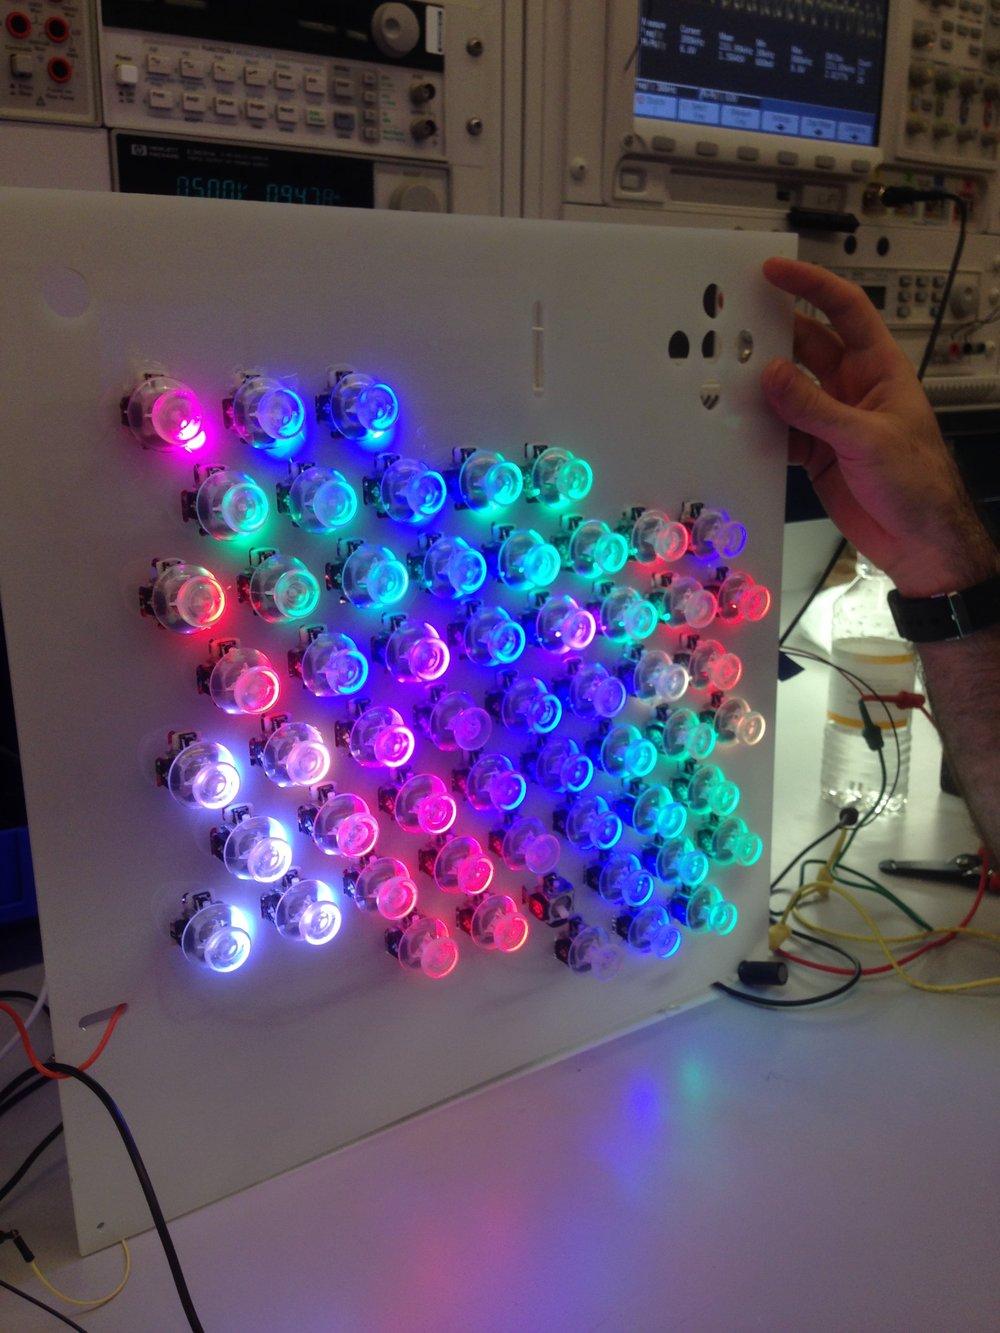 test_lights.jpeg